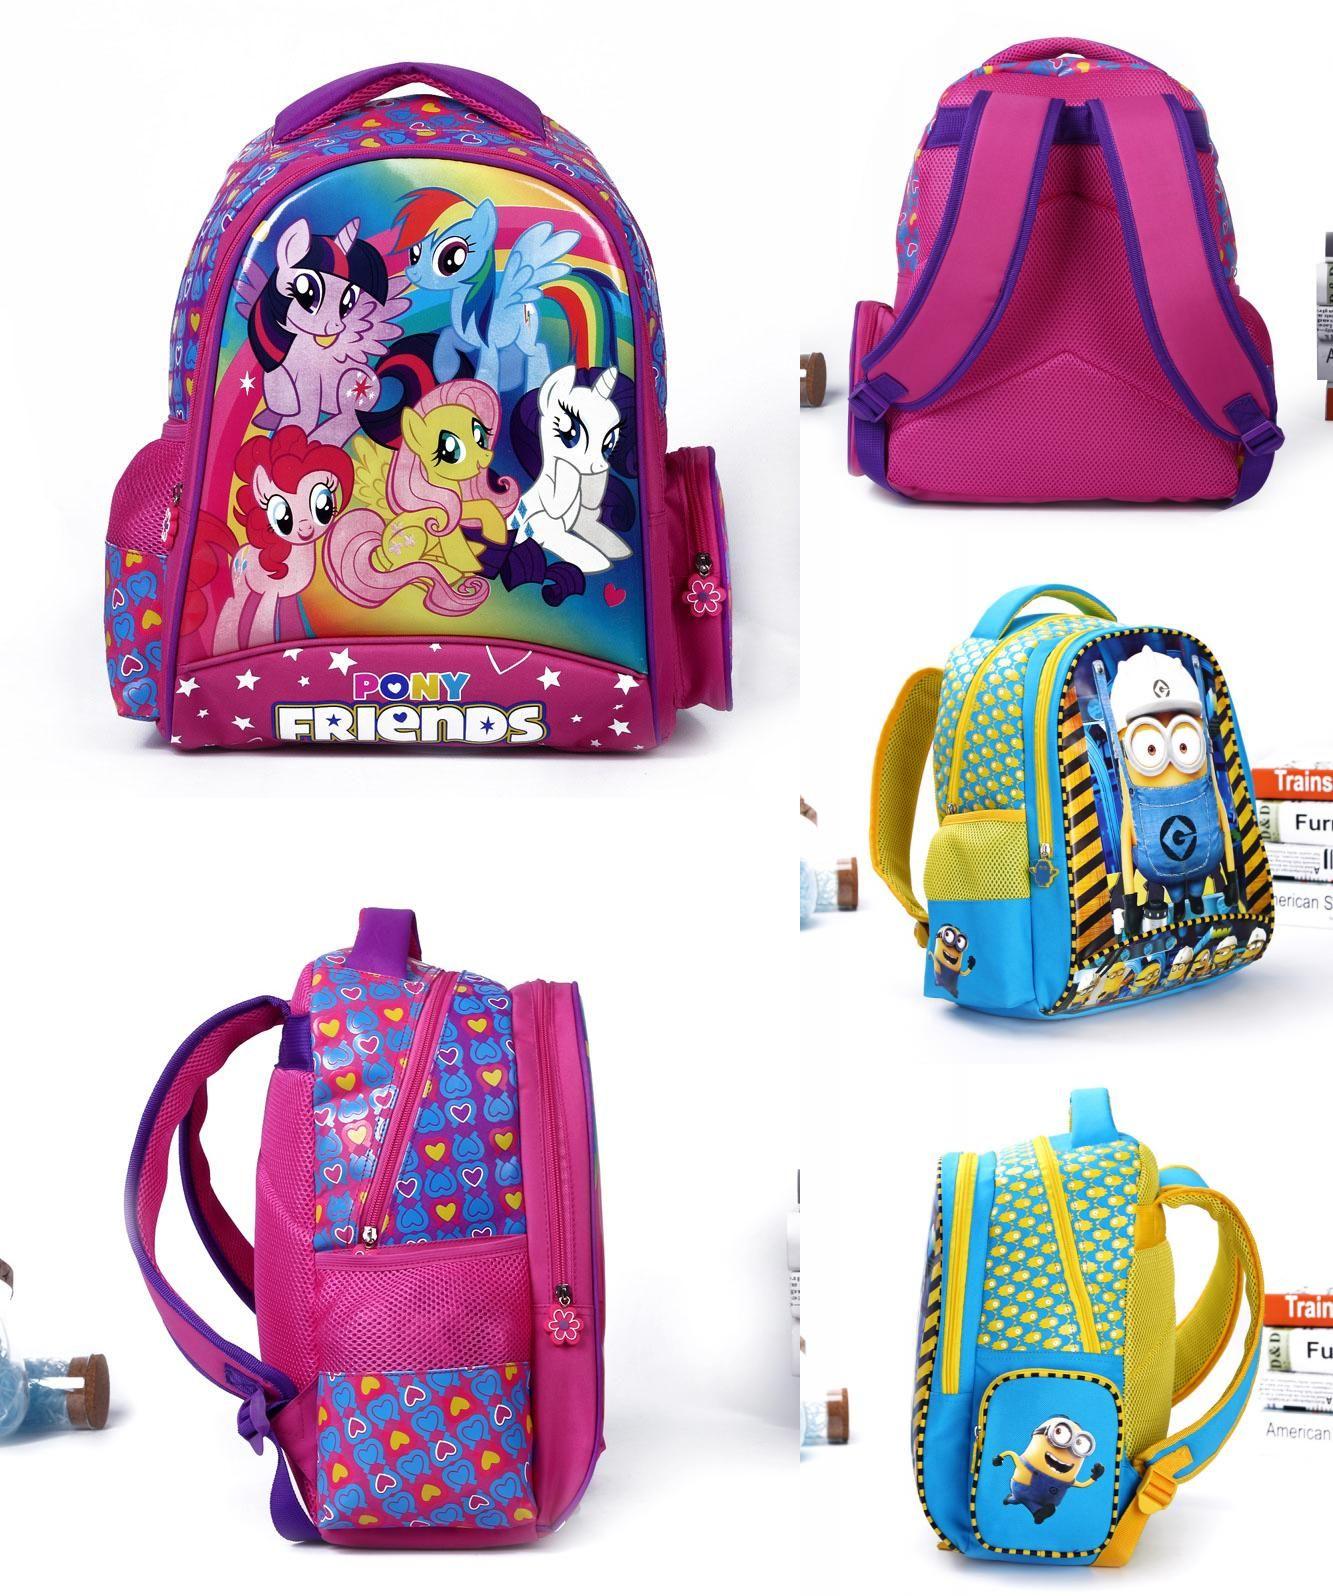 e59c4da21 [Visit to Buy] Cartoon my little pony children school bags for girls lovely backpack  kid schoolbag boys minions child mochila escolar infantil # ...